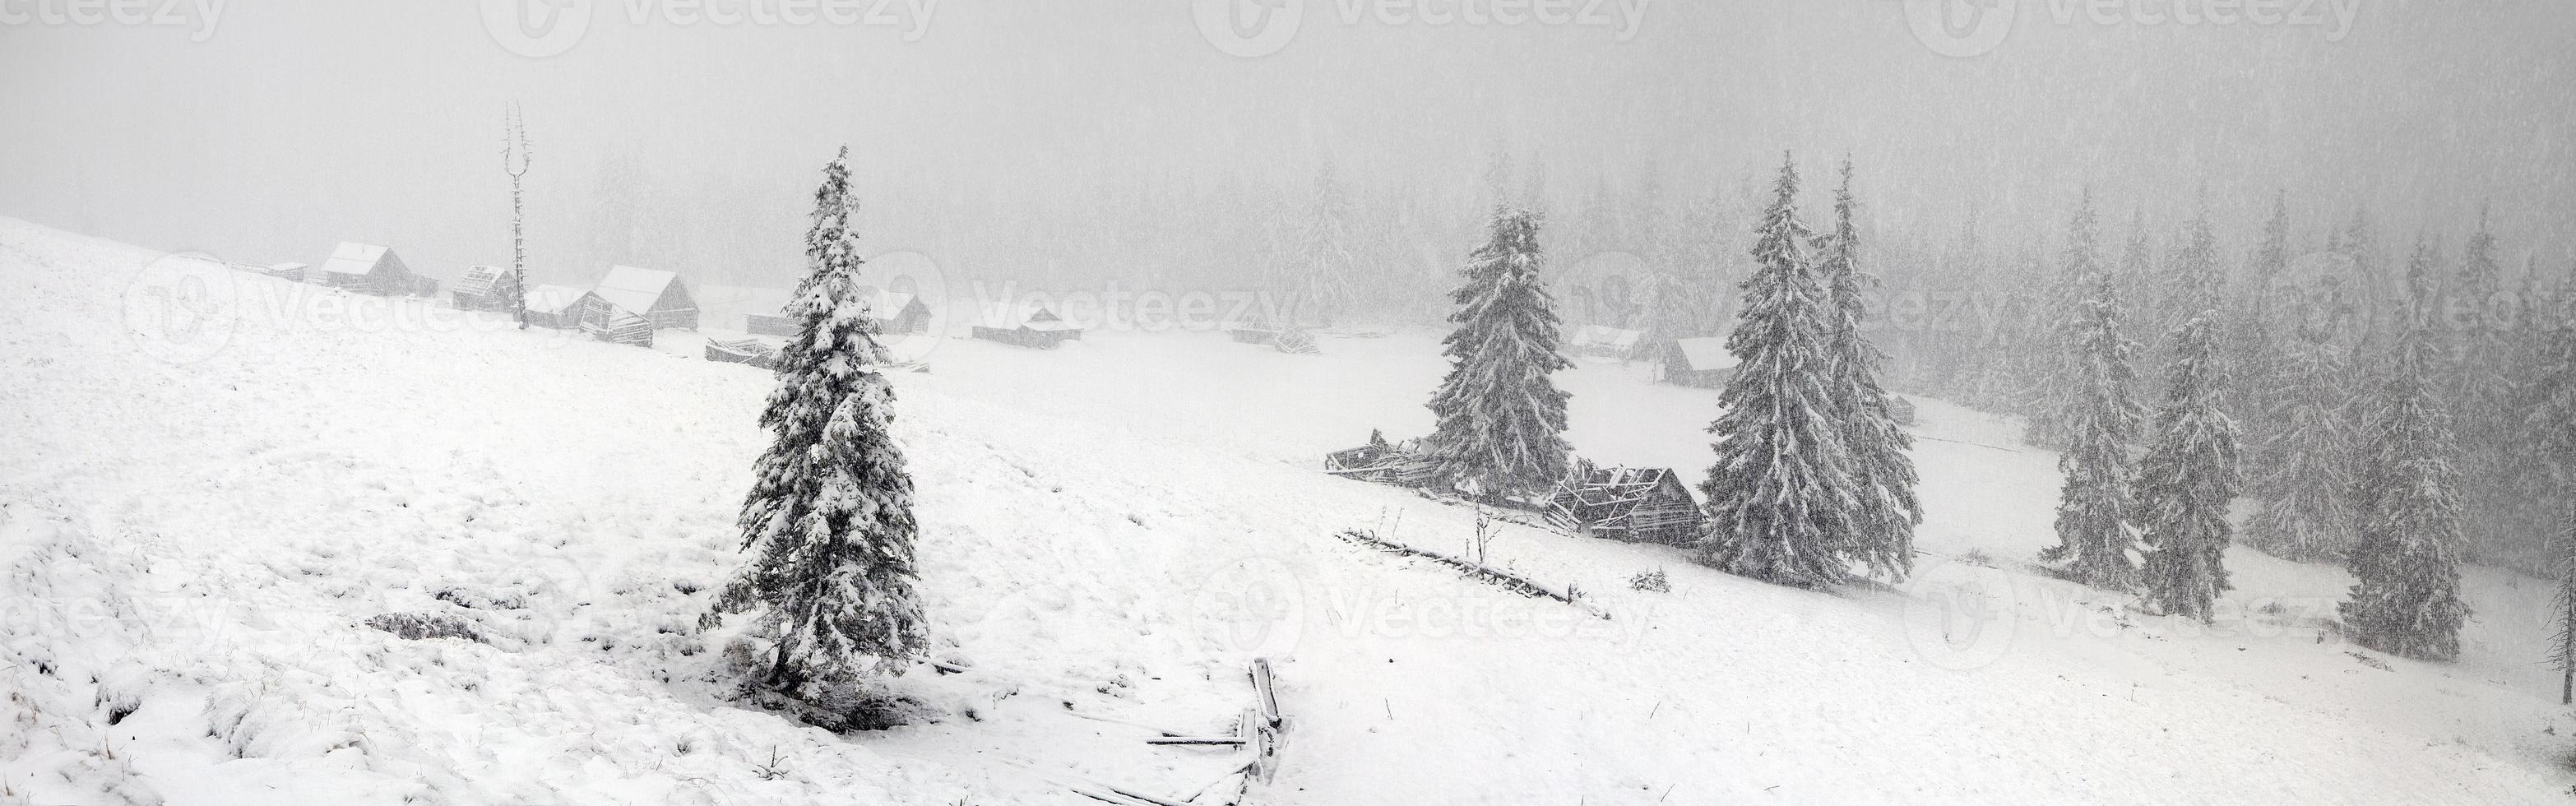 alpint är klimatet foto